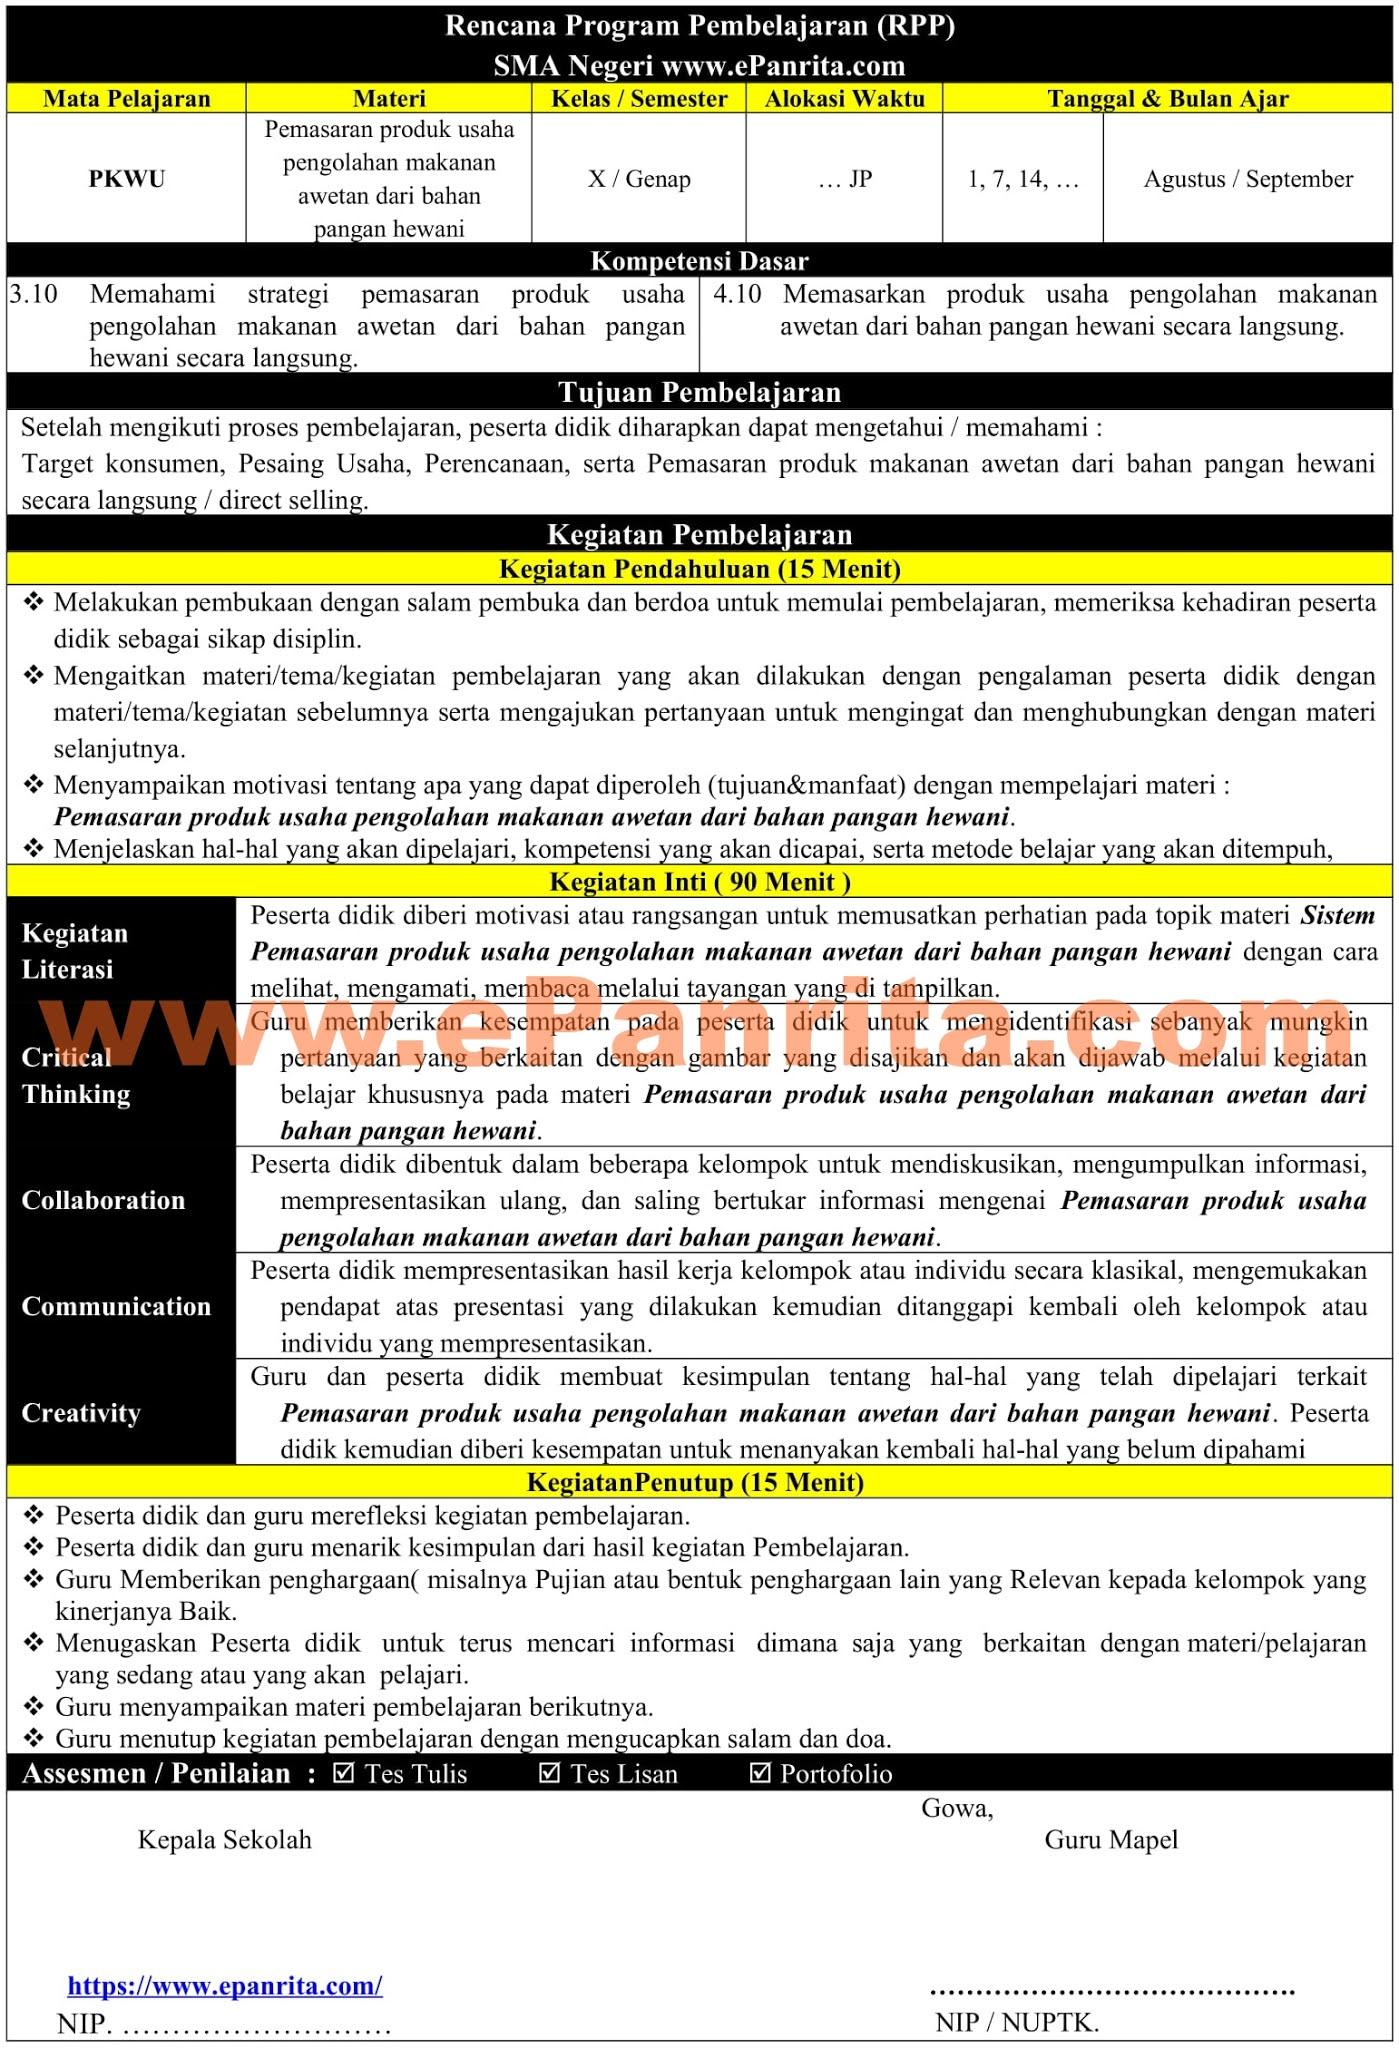 RPP 1 Halaman Prakarya Aspek Pengolahan (Pemasaran produk usaha pengolahan makanan awetan dari bahan pangan hewani)